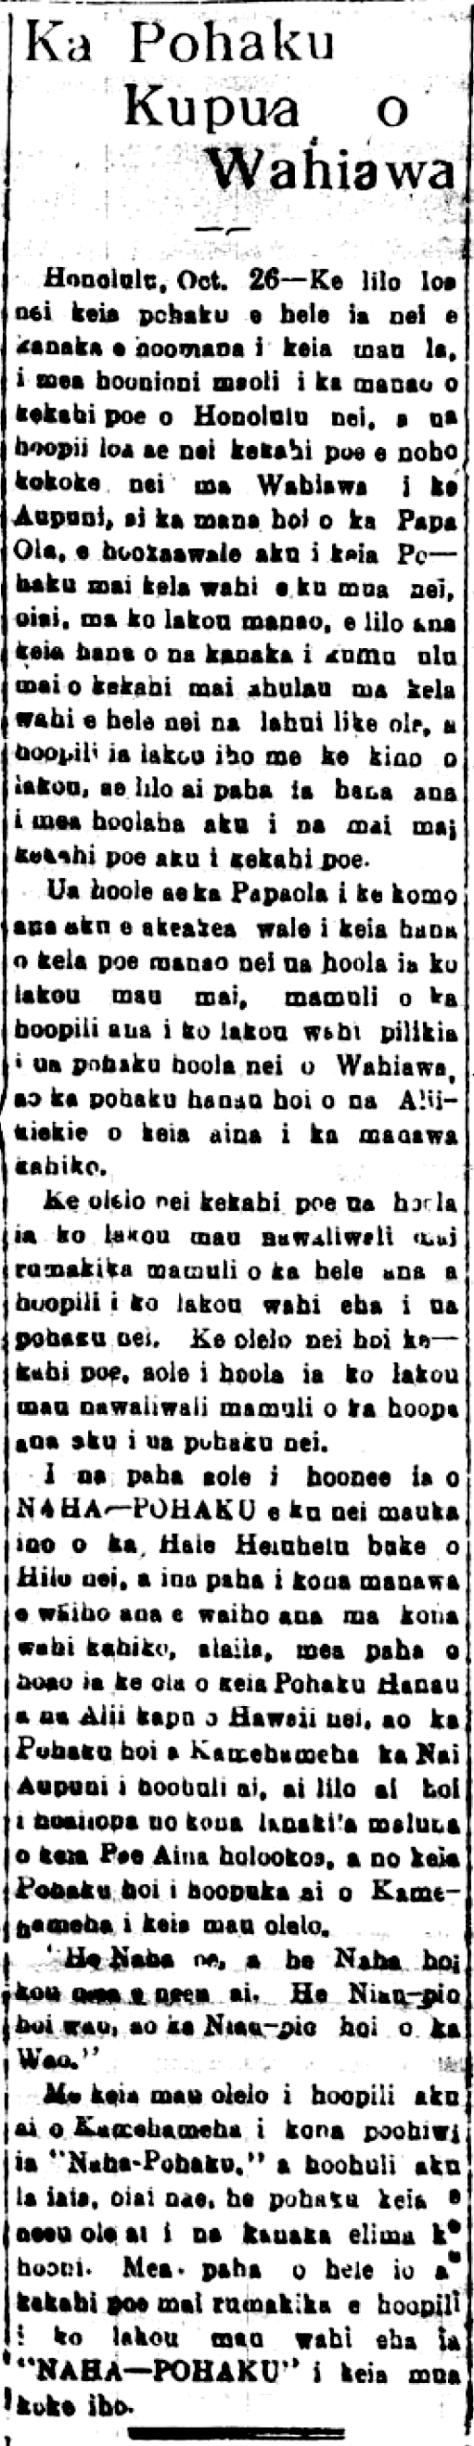 Ka Pohaku Kupua o Wahiawa